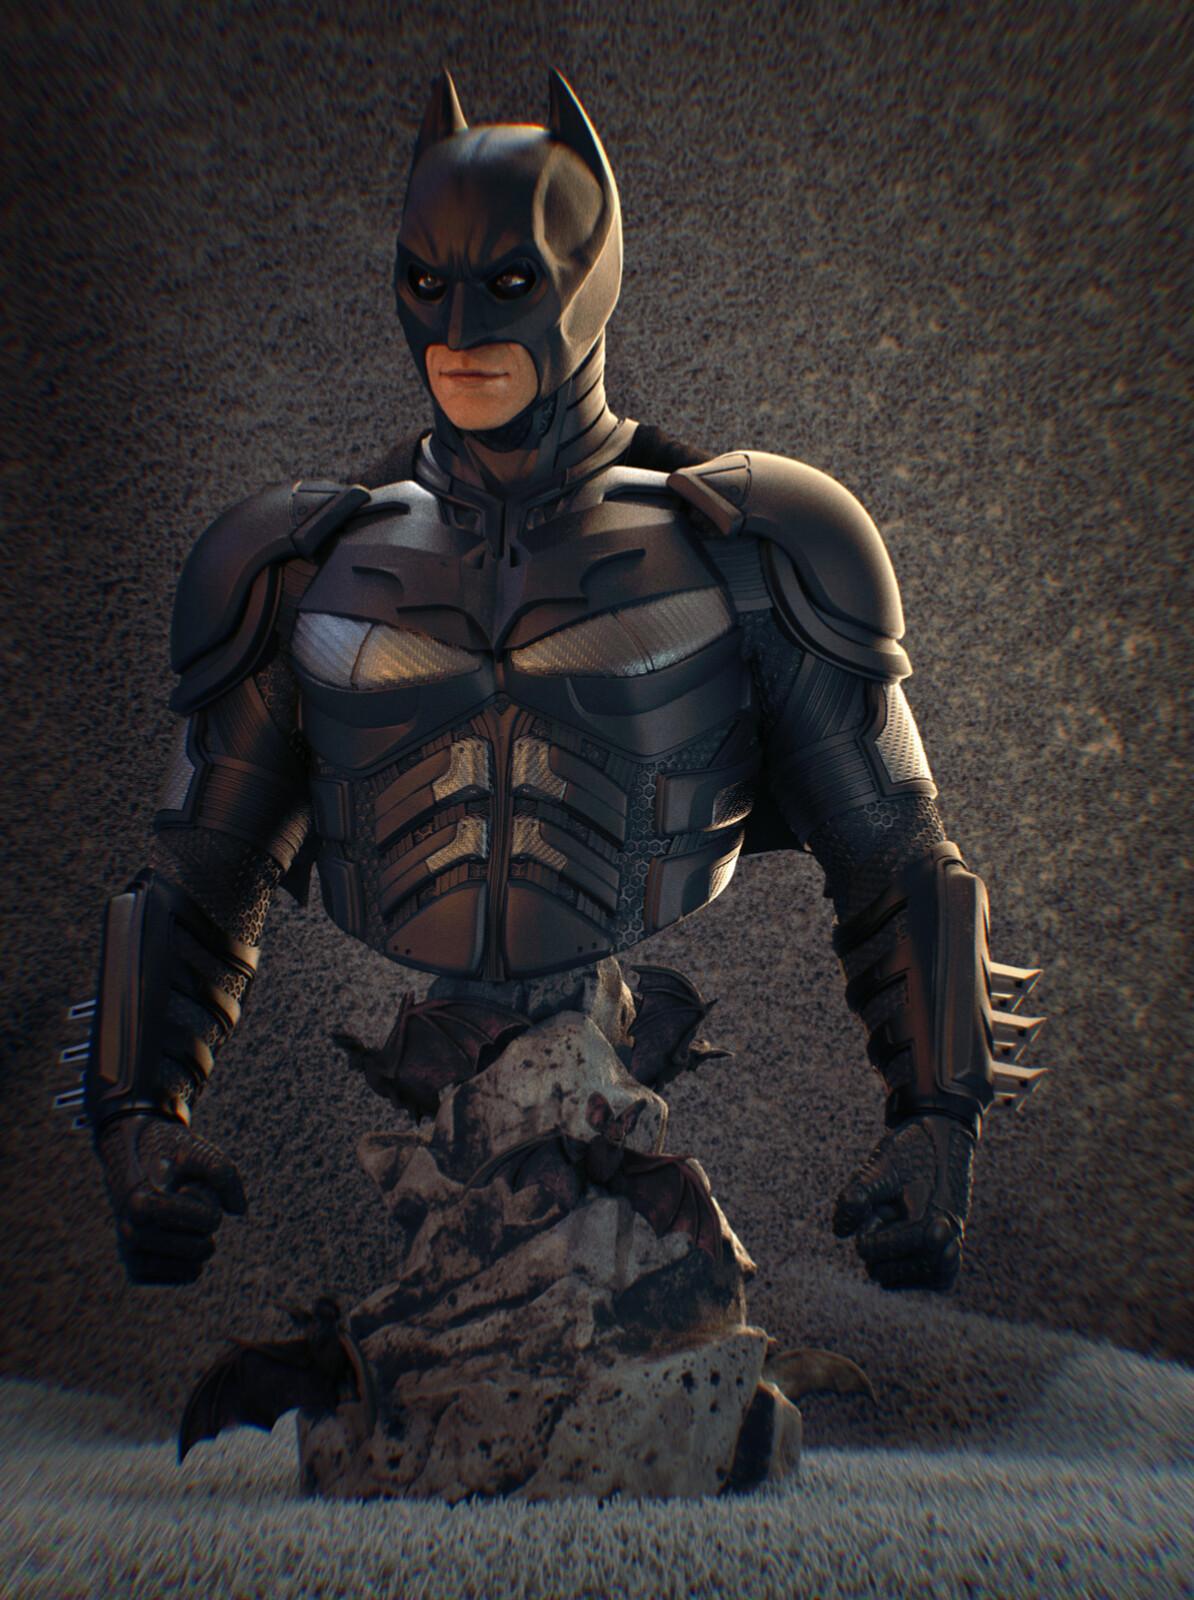 Dark Knight Bust Collectible